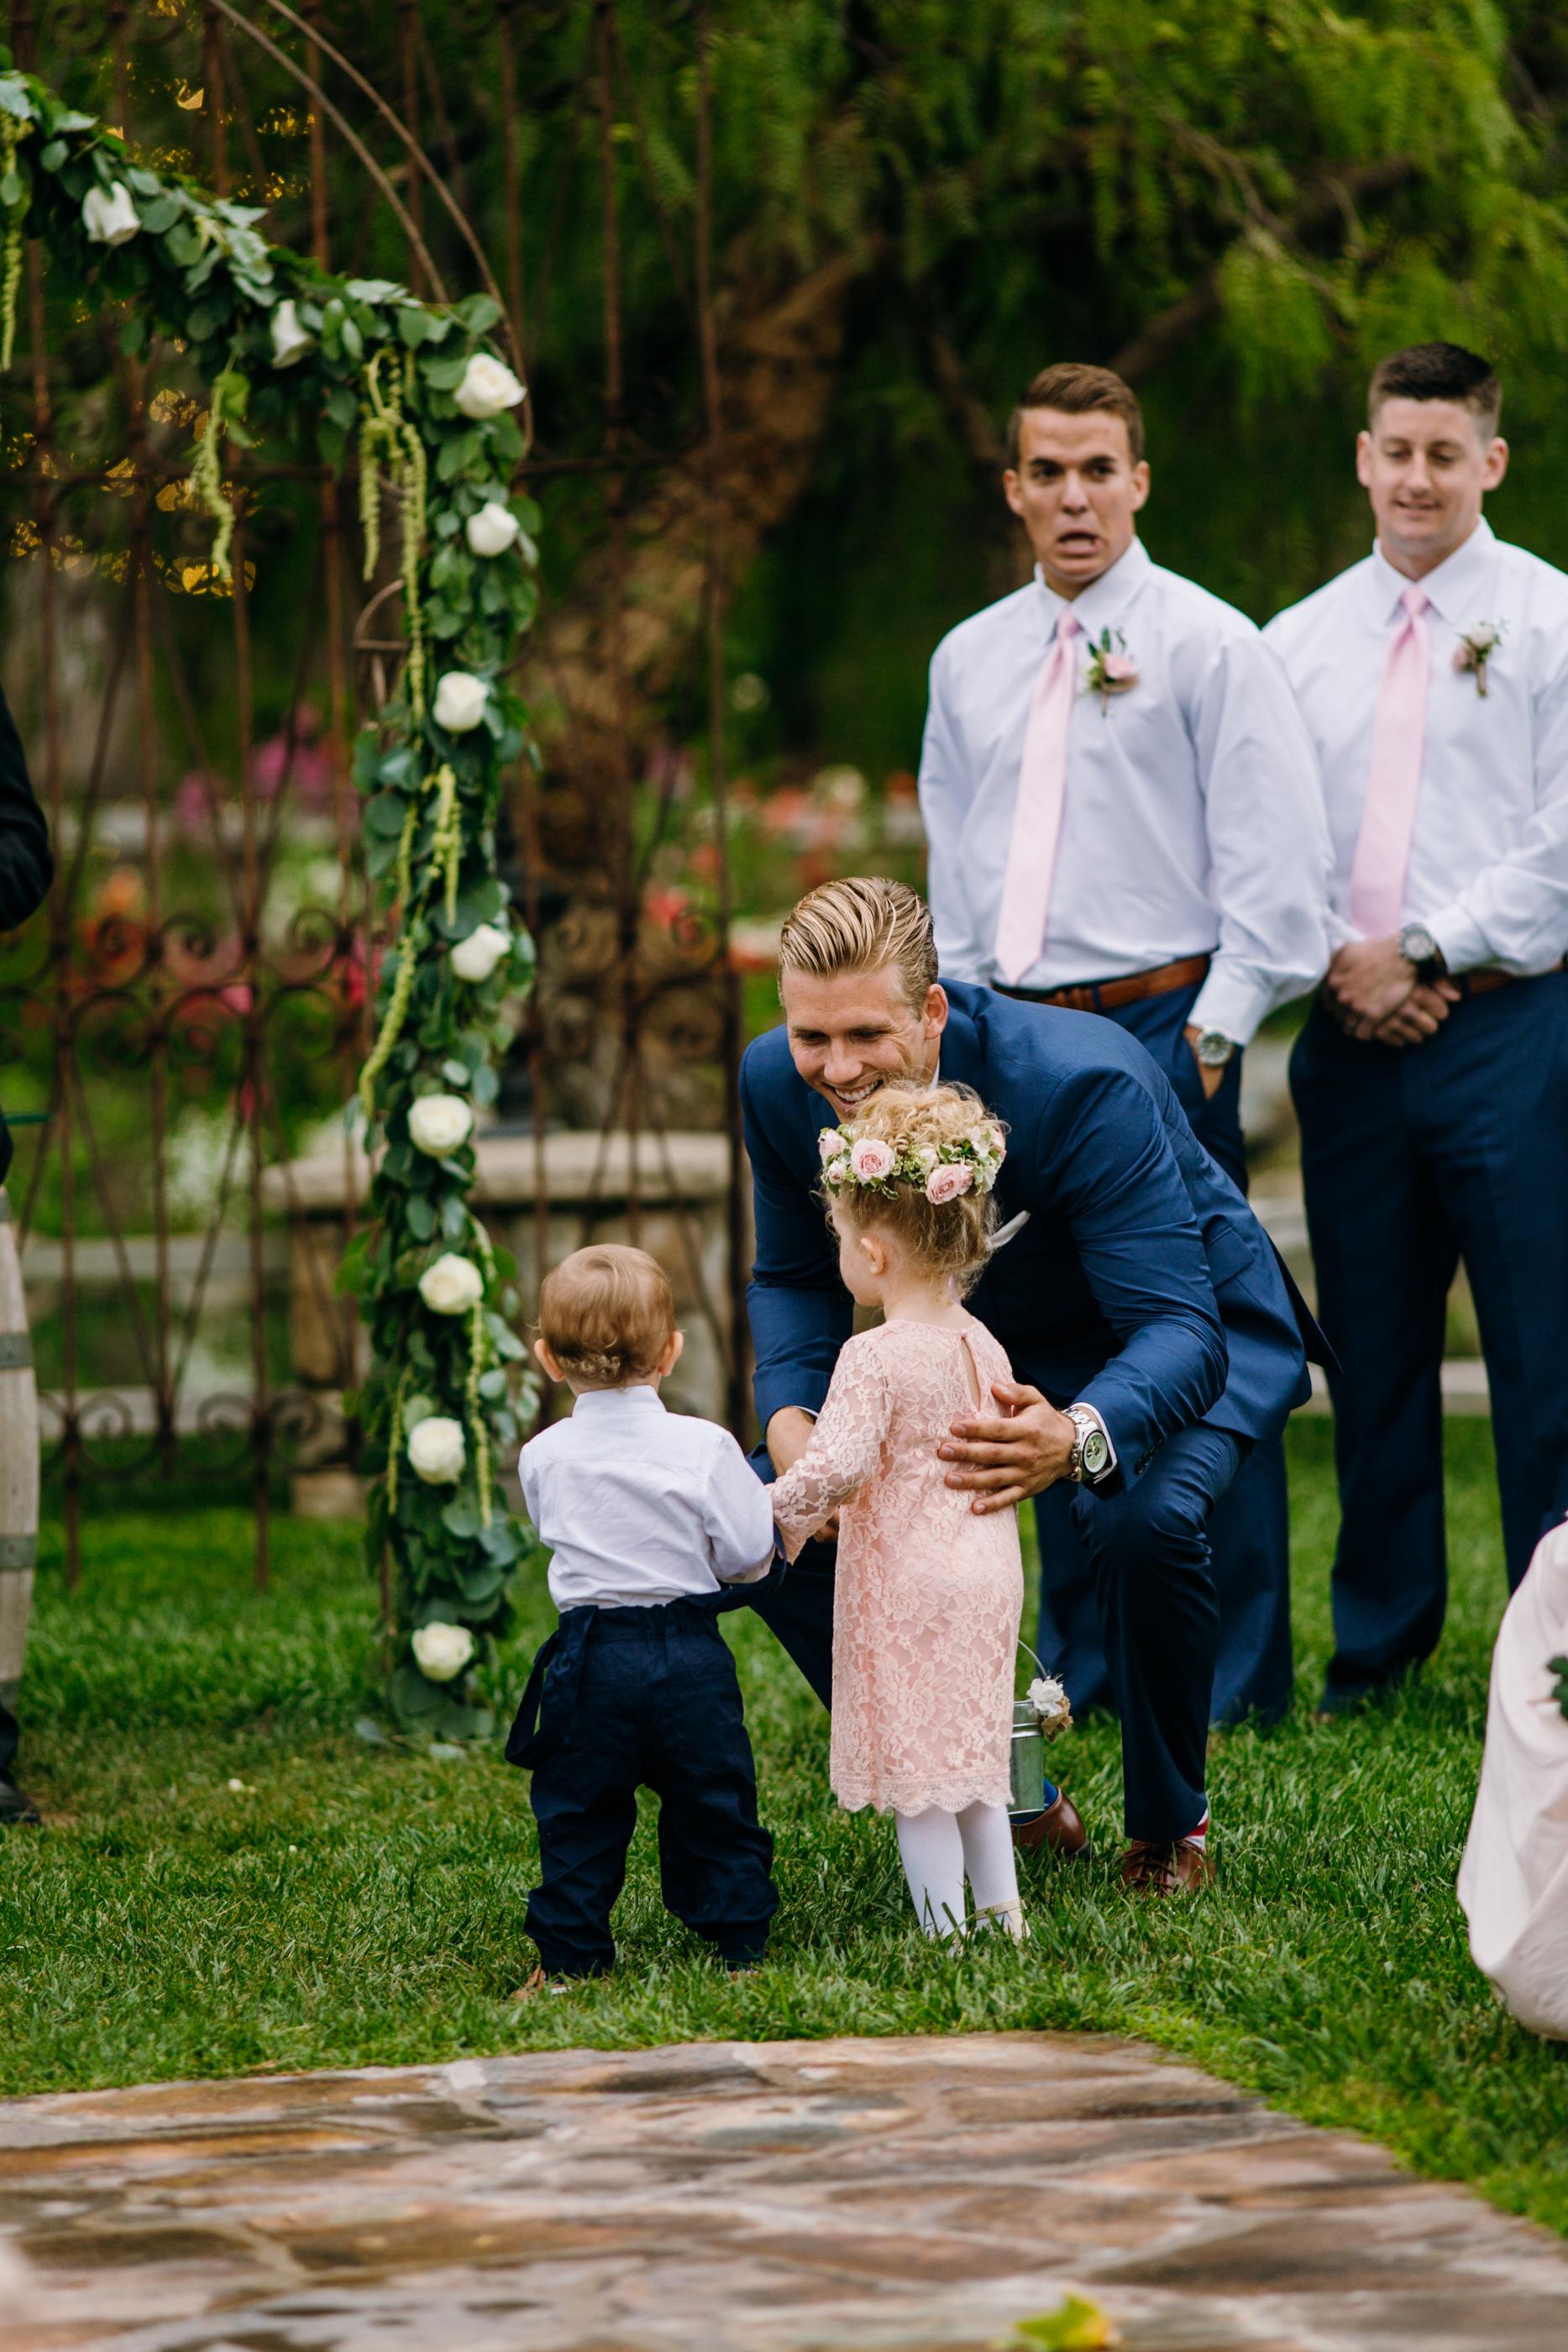 KaraNixonWeddings-LakeOakMeadows-Temecula-Wedding-28.jpg